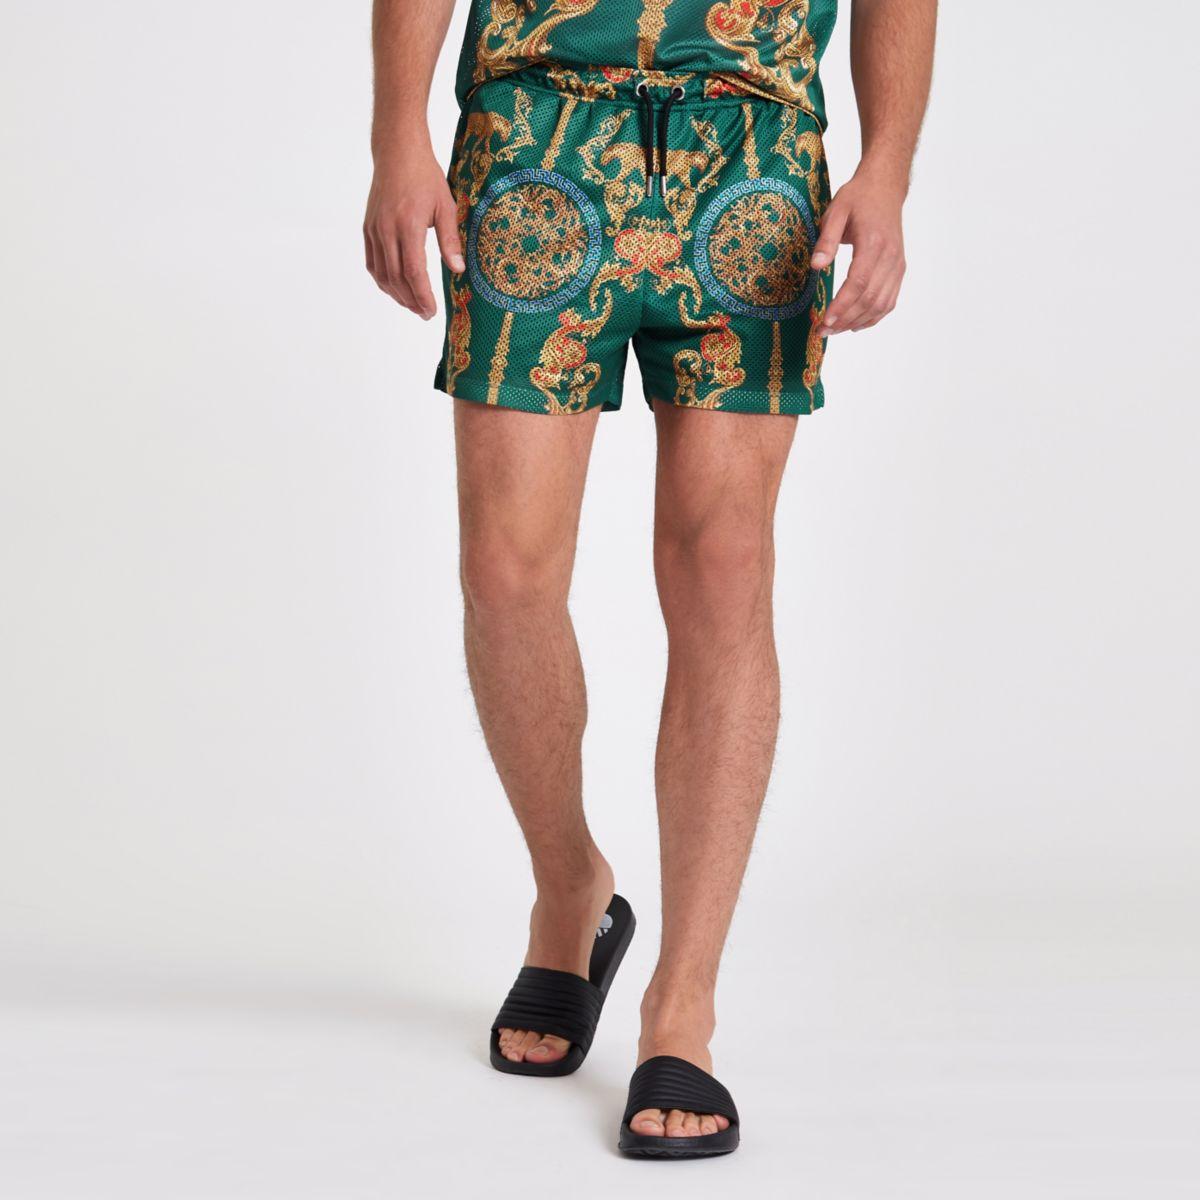 Green Mesh Baroque Print Slim Fit Shorts by River Island